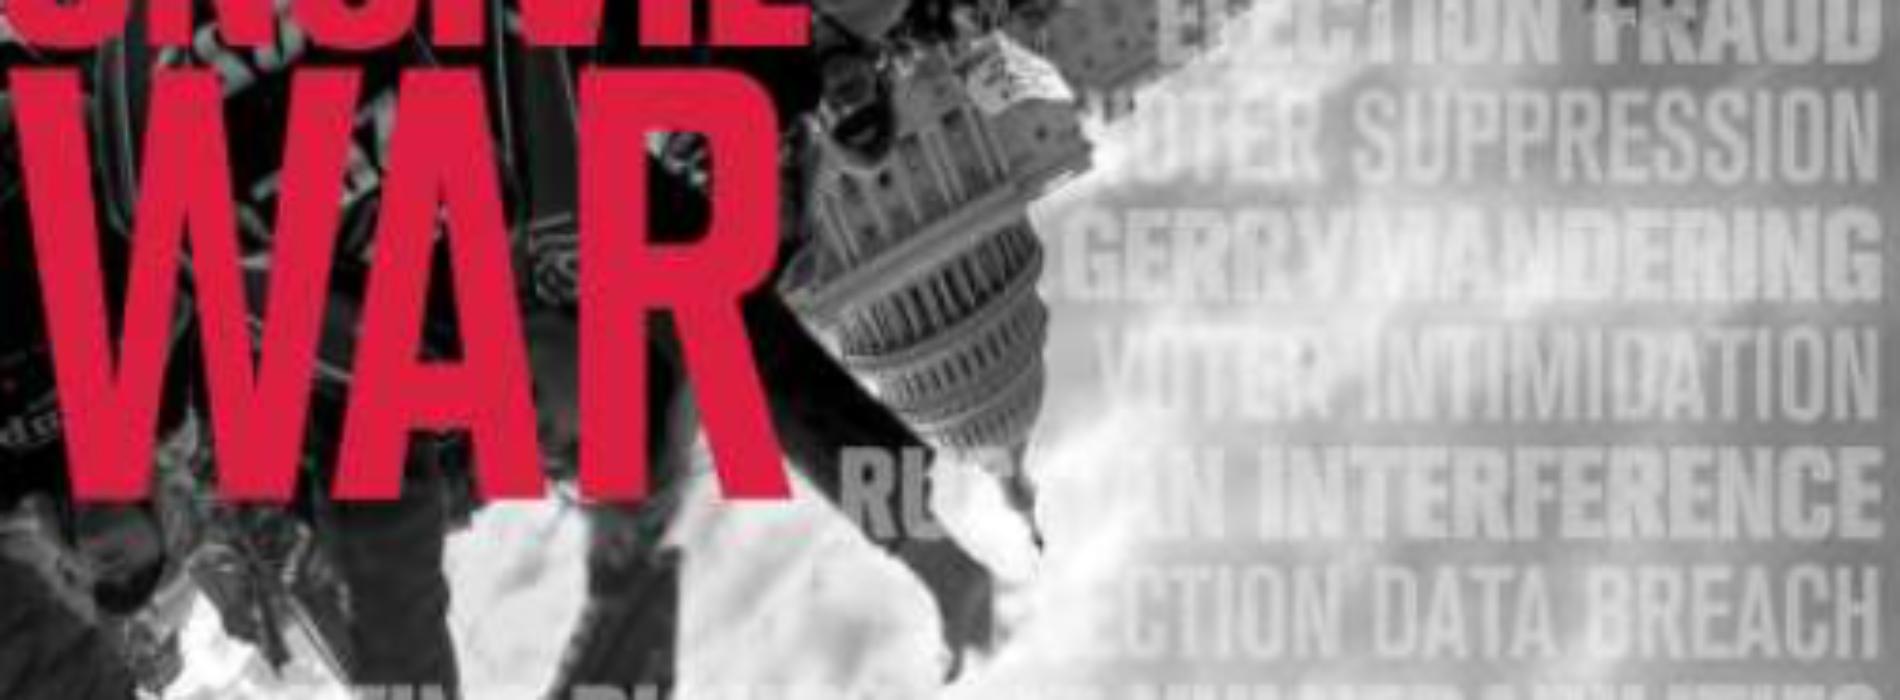 Uncivil War: US Elections Under Siege